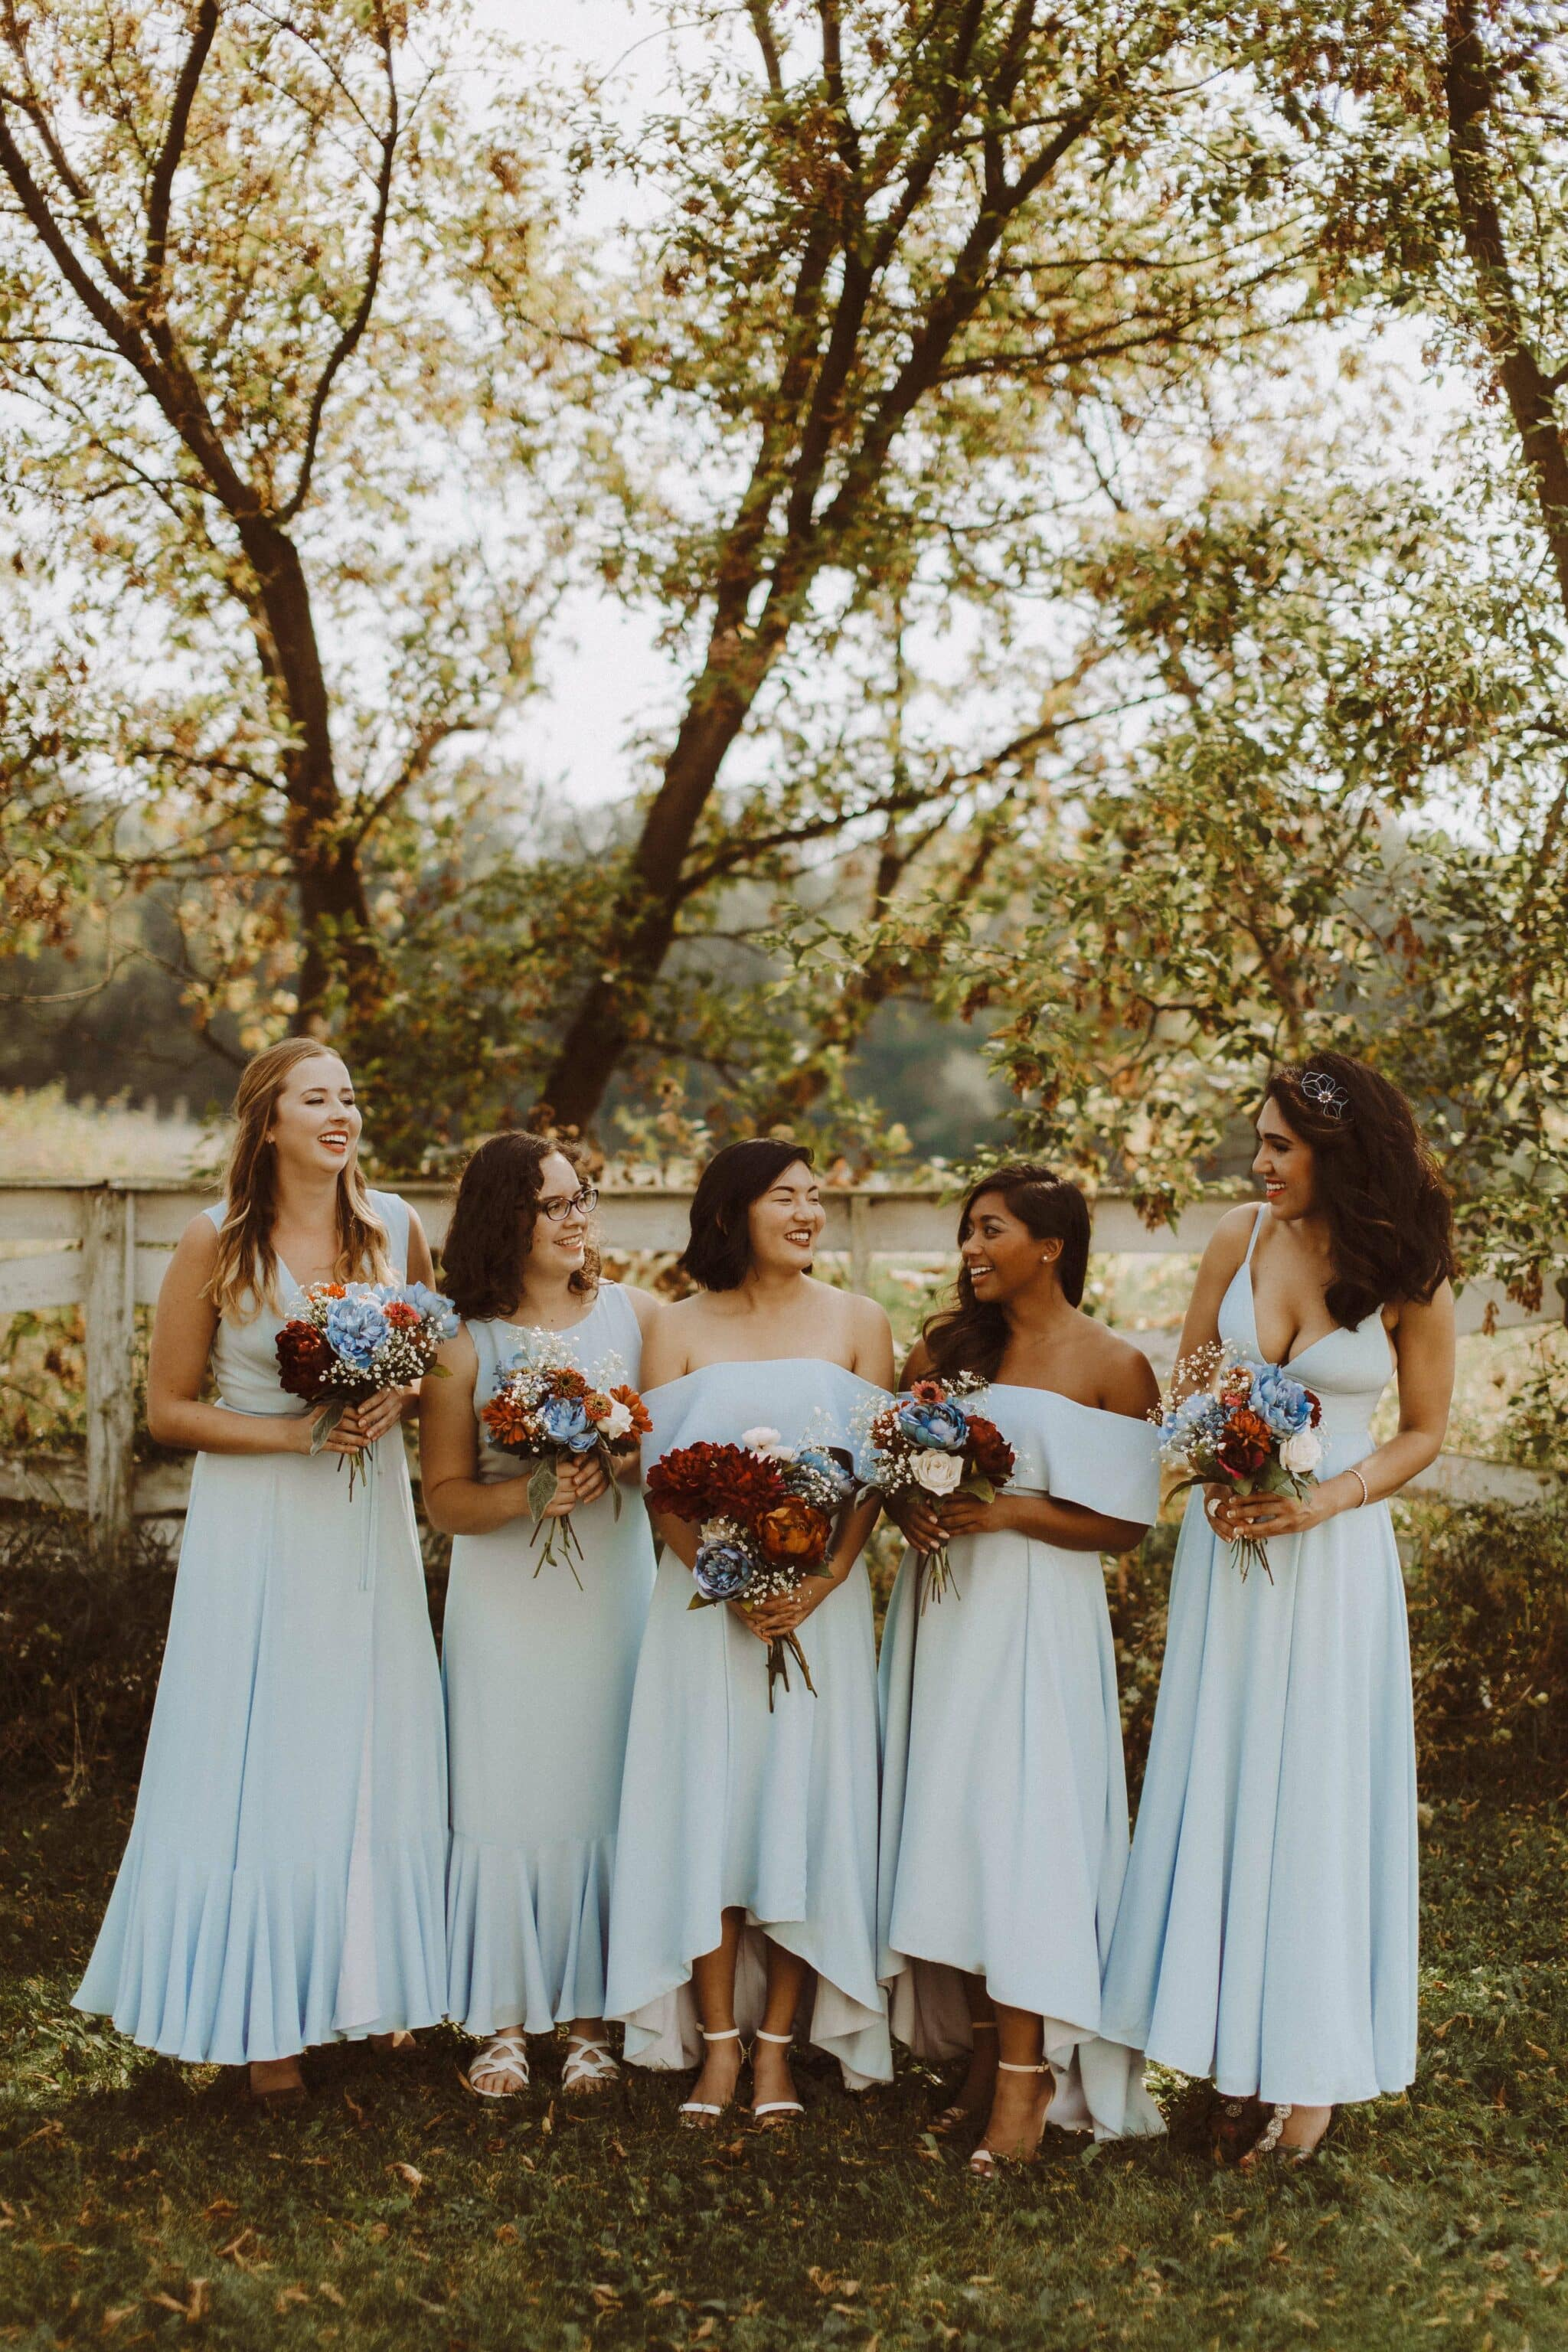 fame partners bridesmaid dress blue